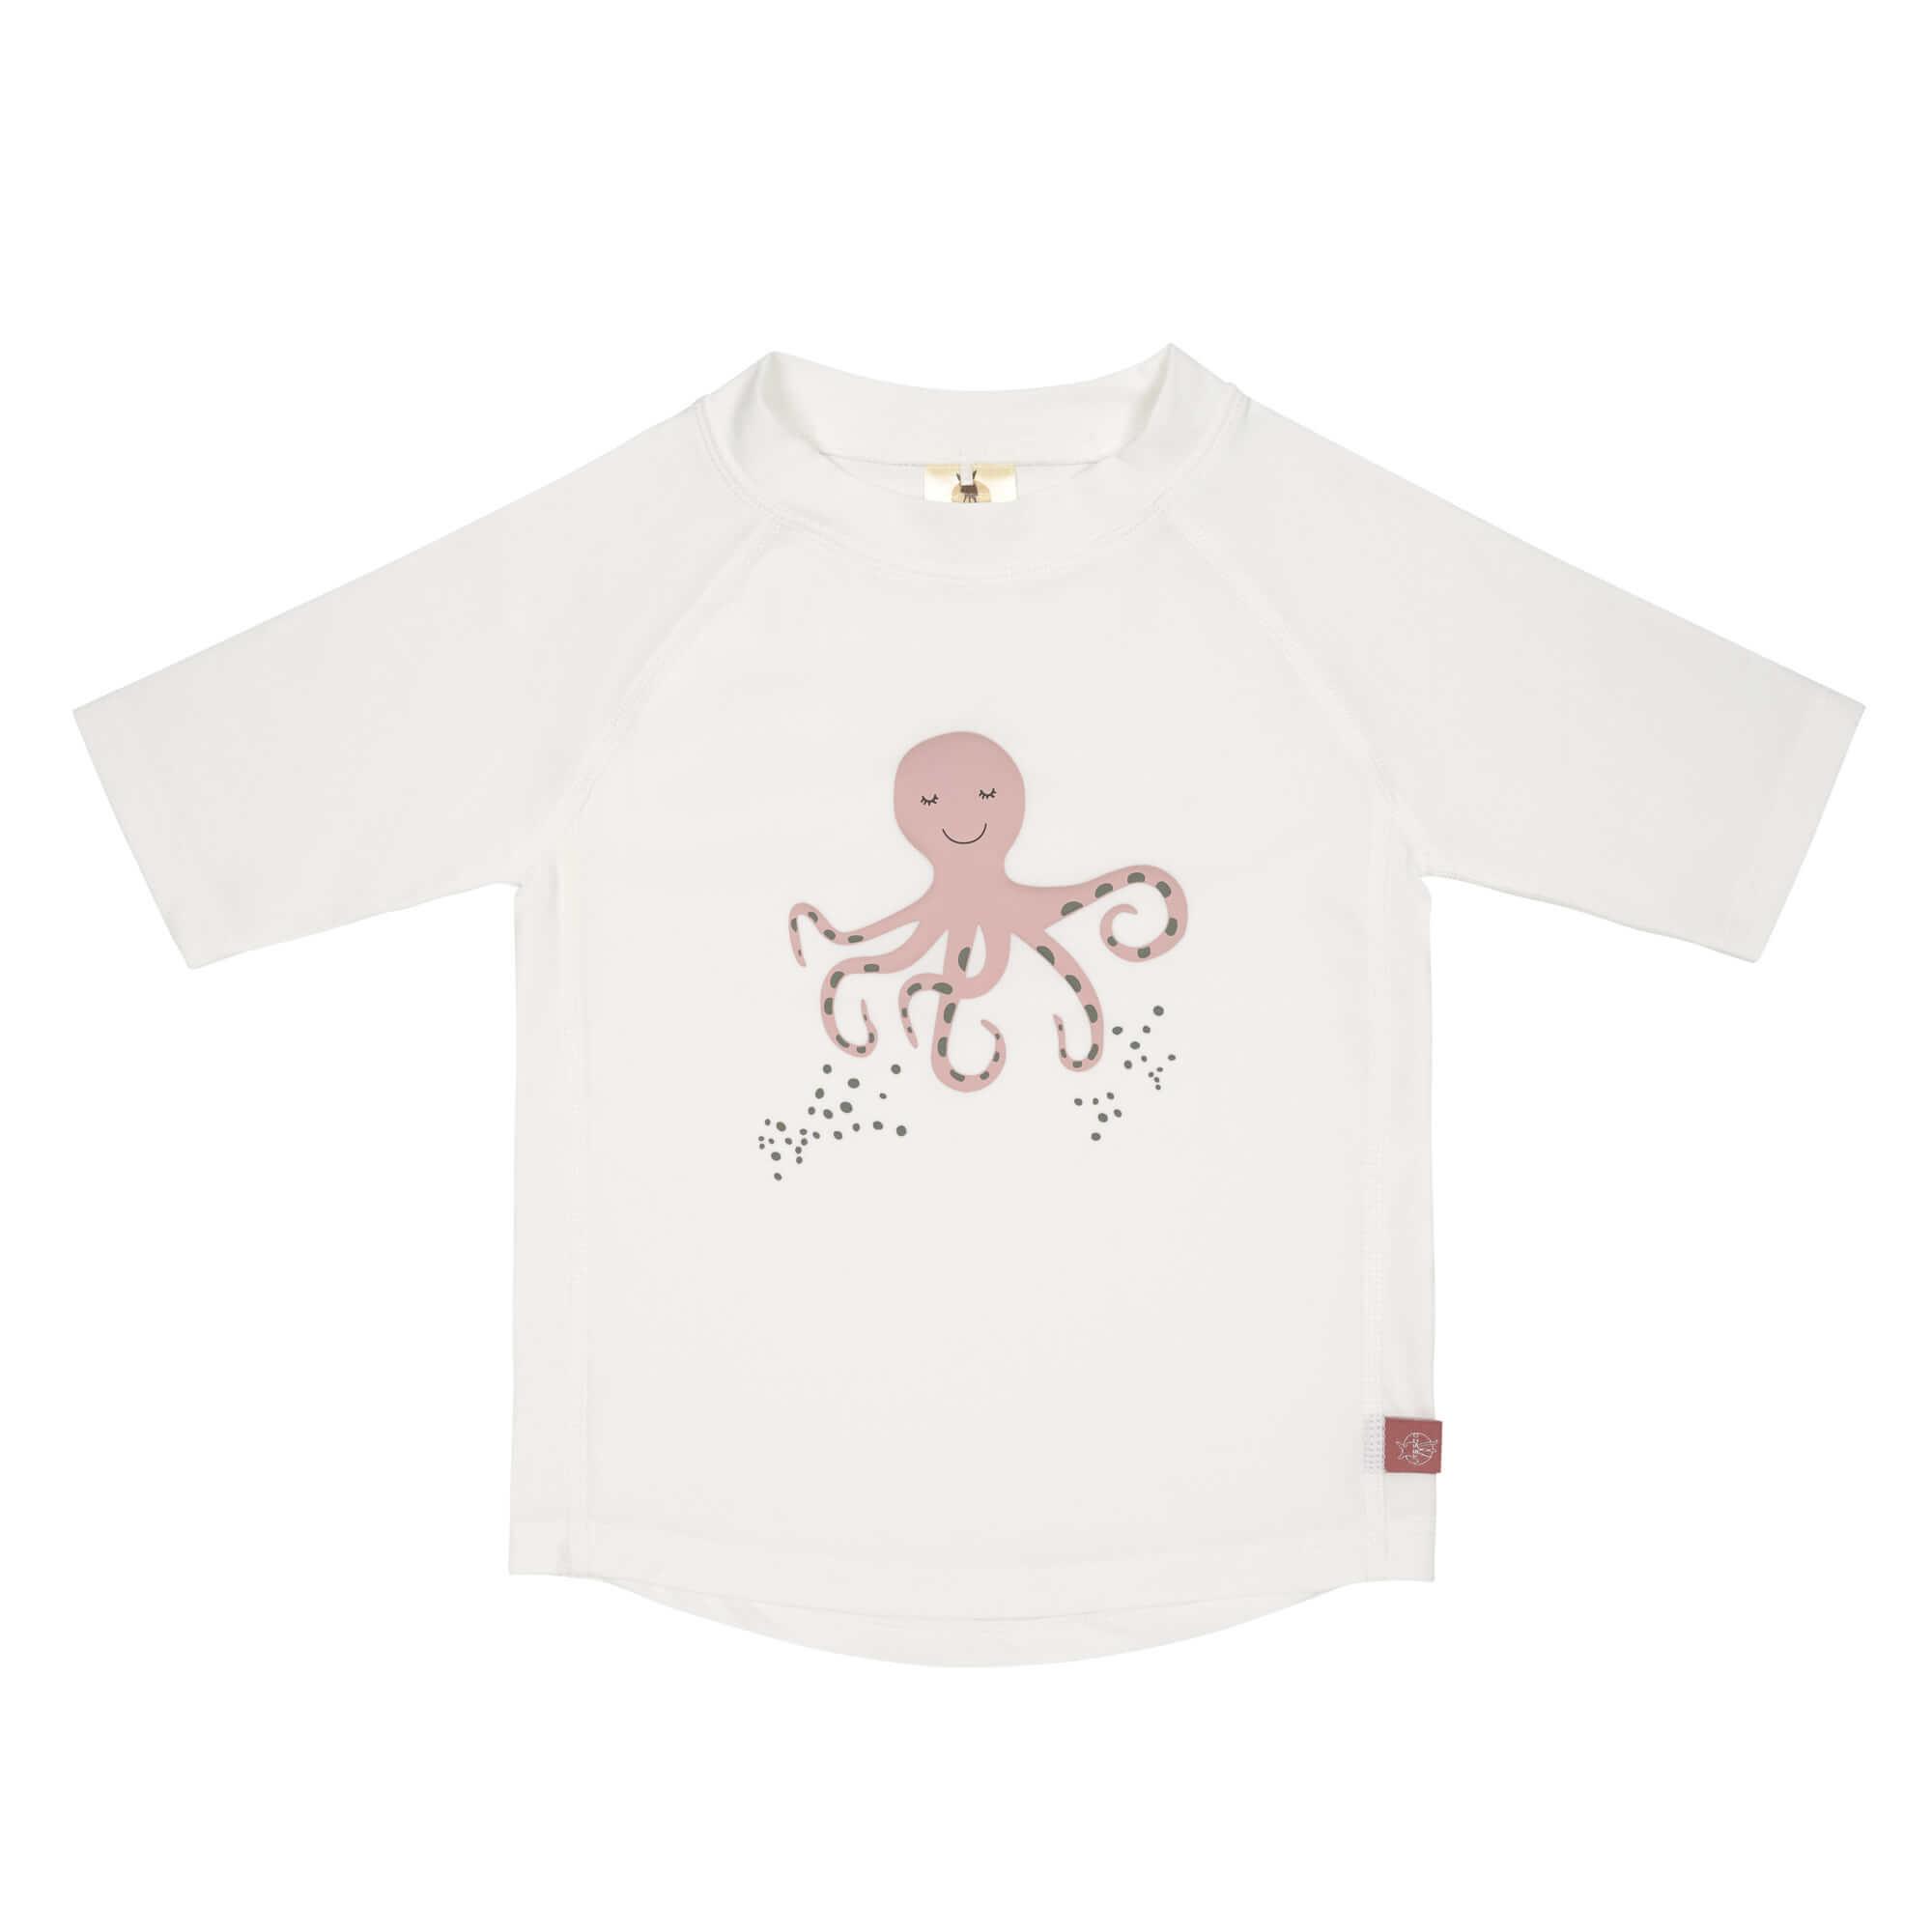 Lässig Lässig Splash & Fun Korte mouw Rashguard UV zwemshirt – Octopus white